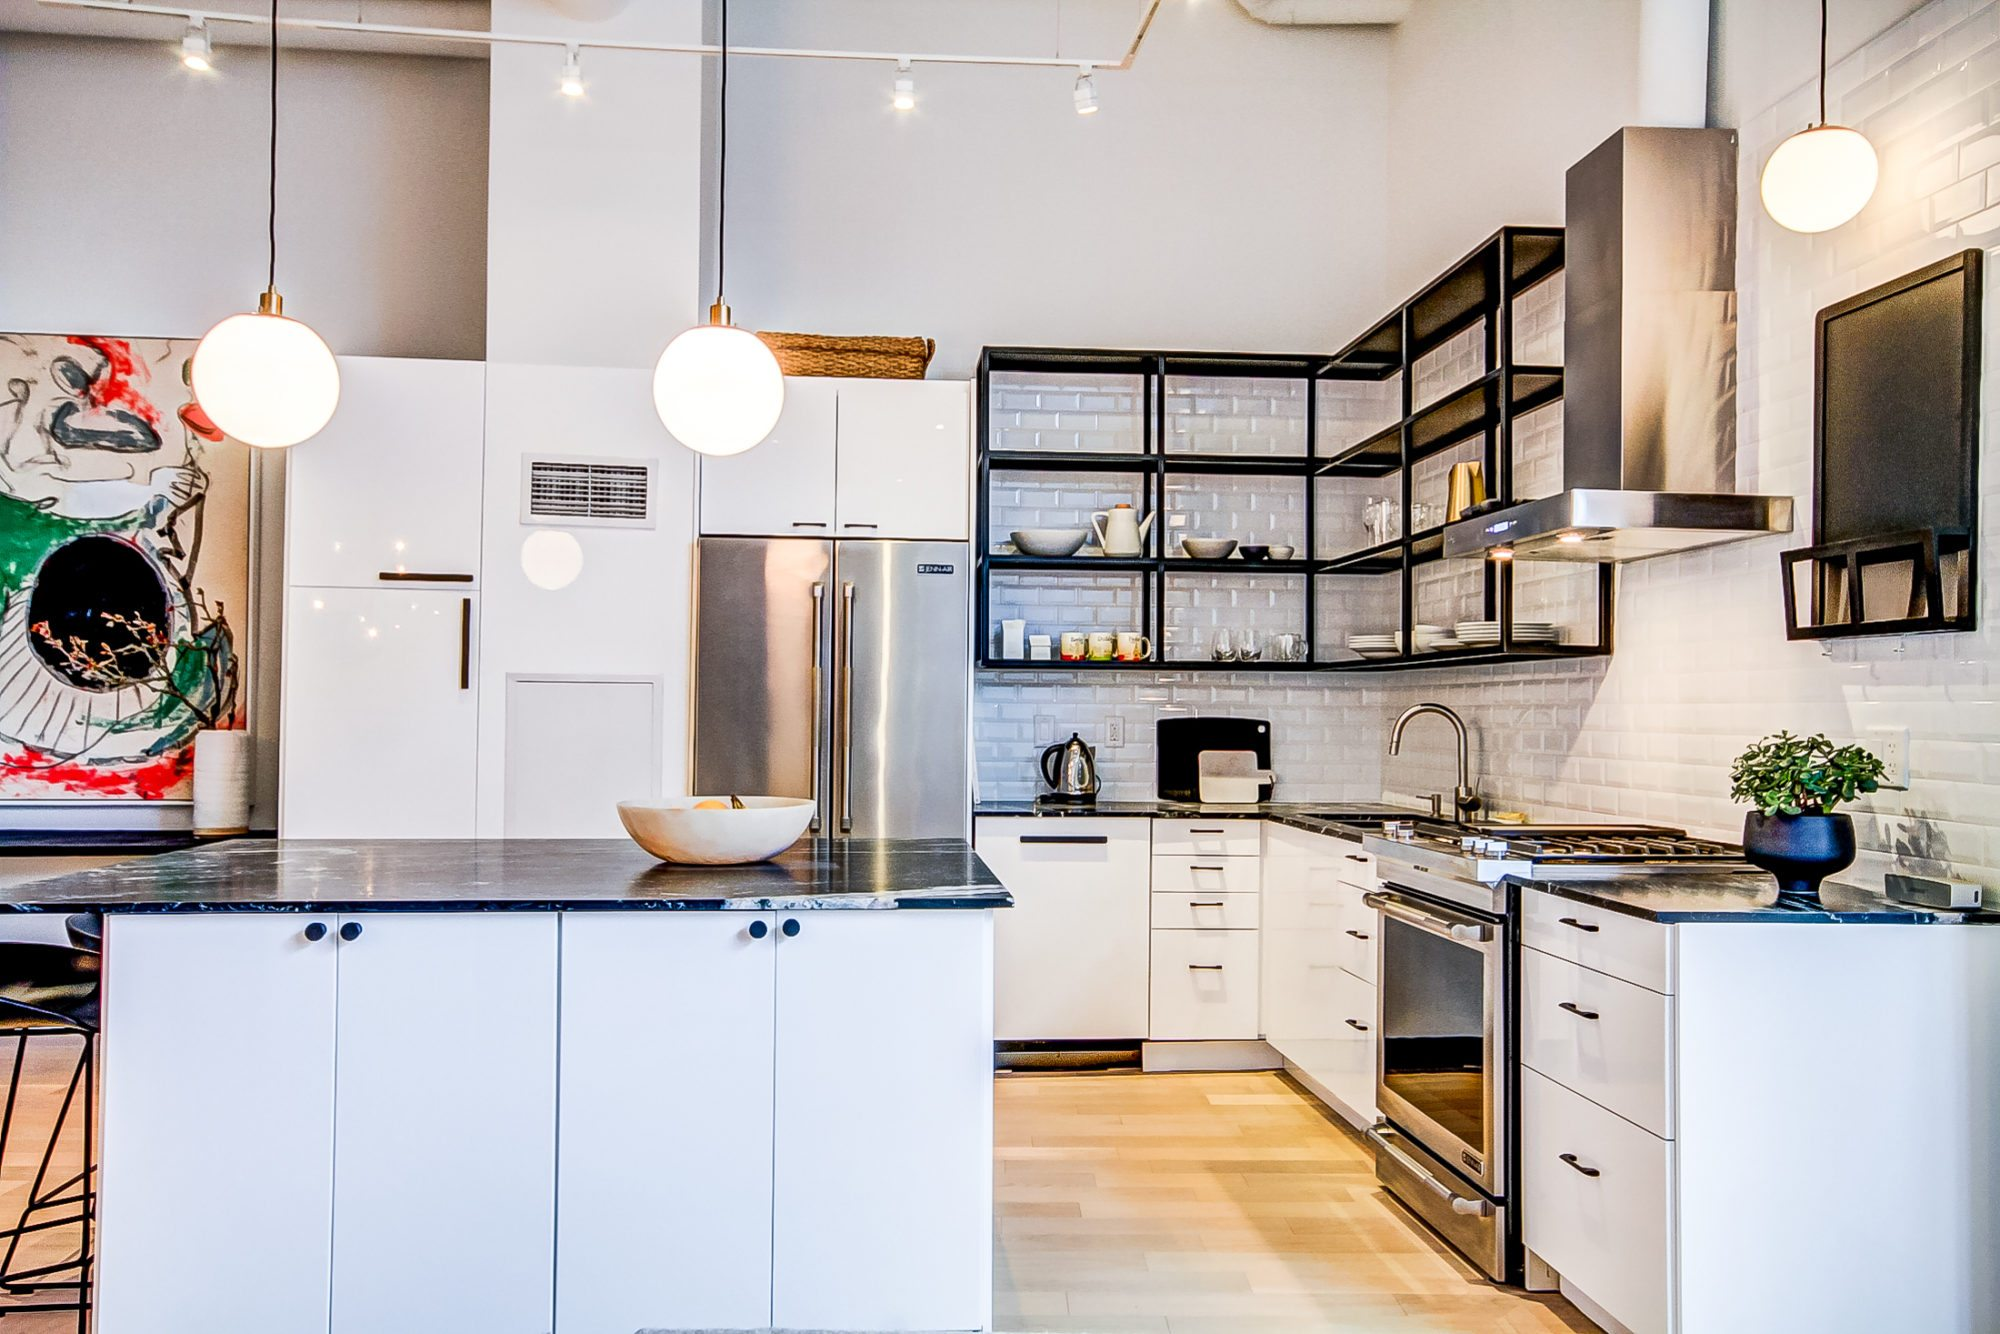 toronto-apartment-for-rent-90-sumach-street-3